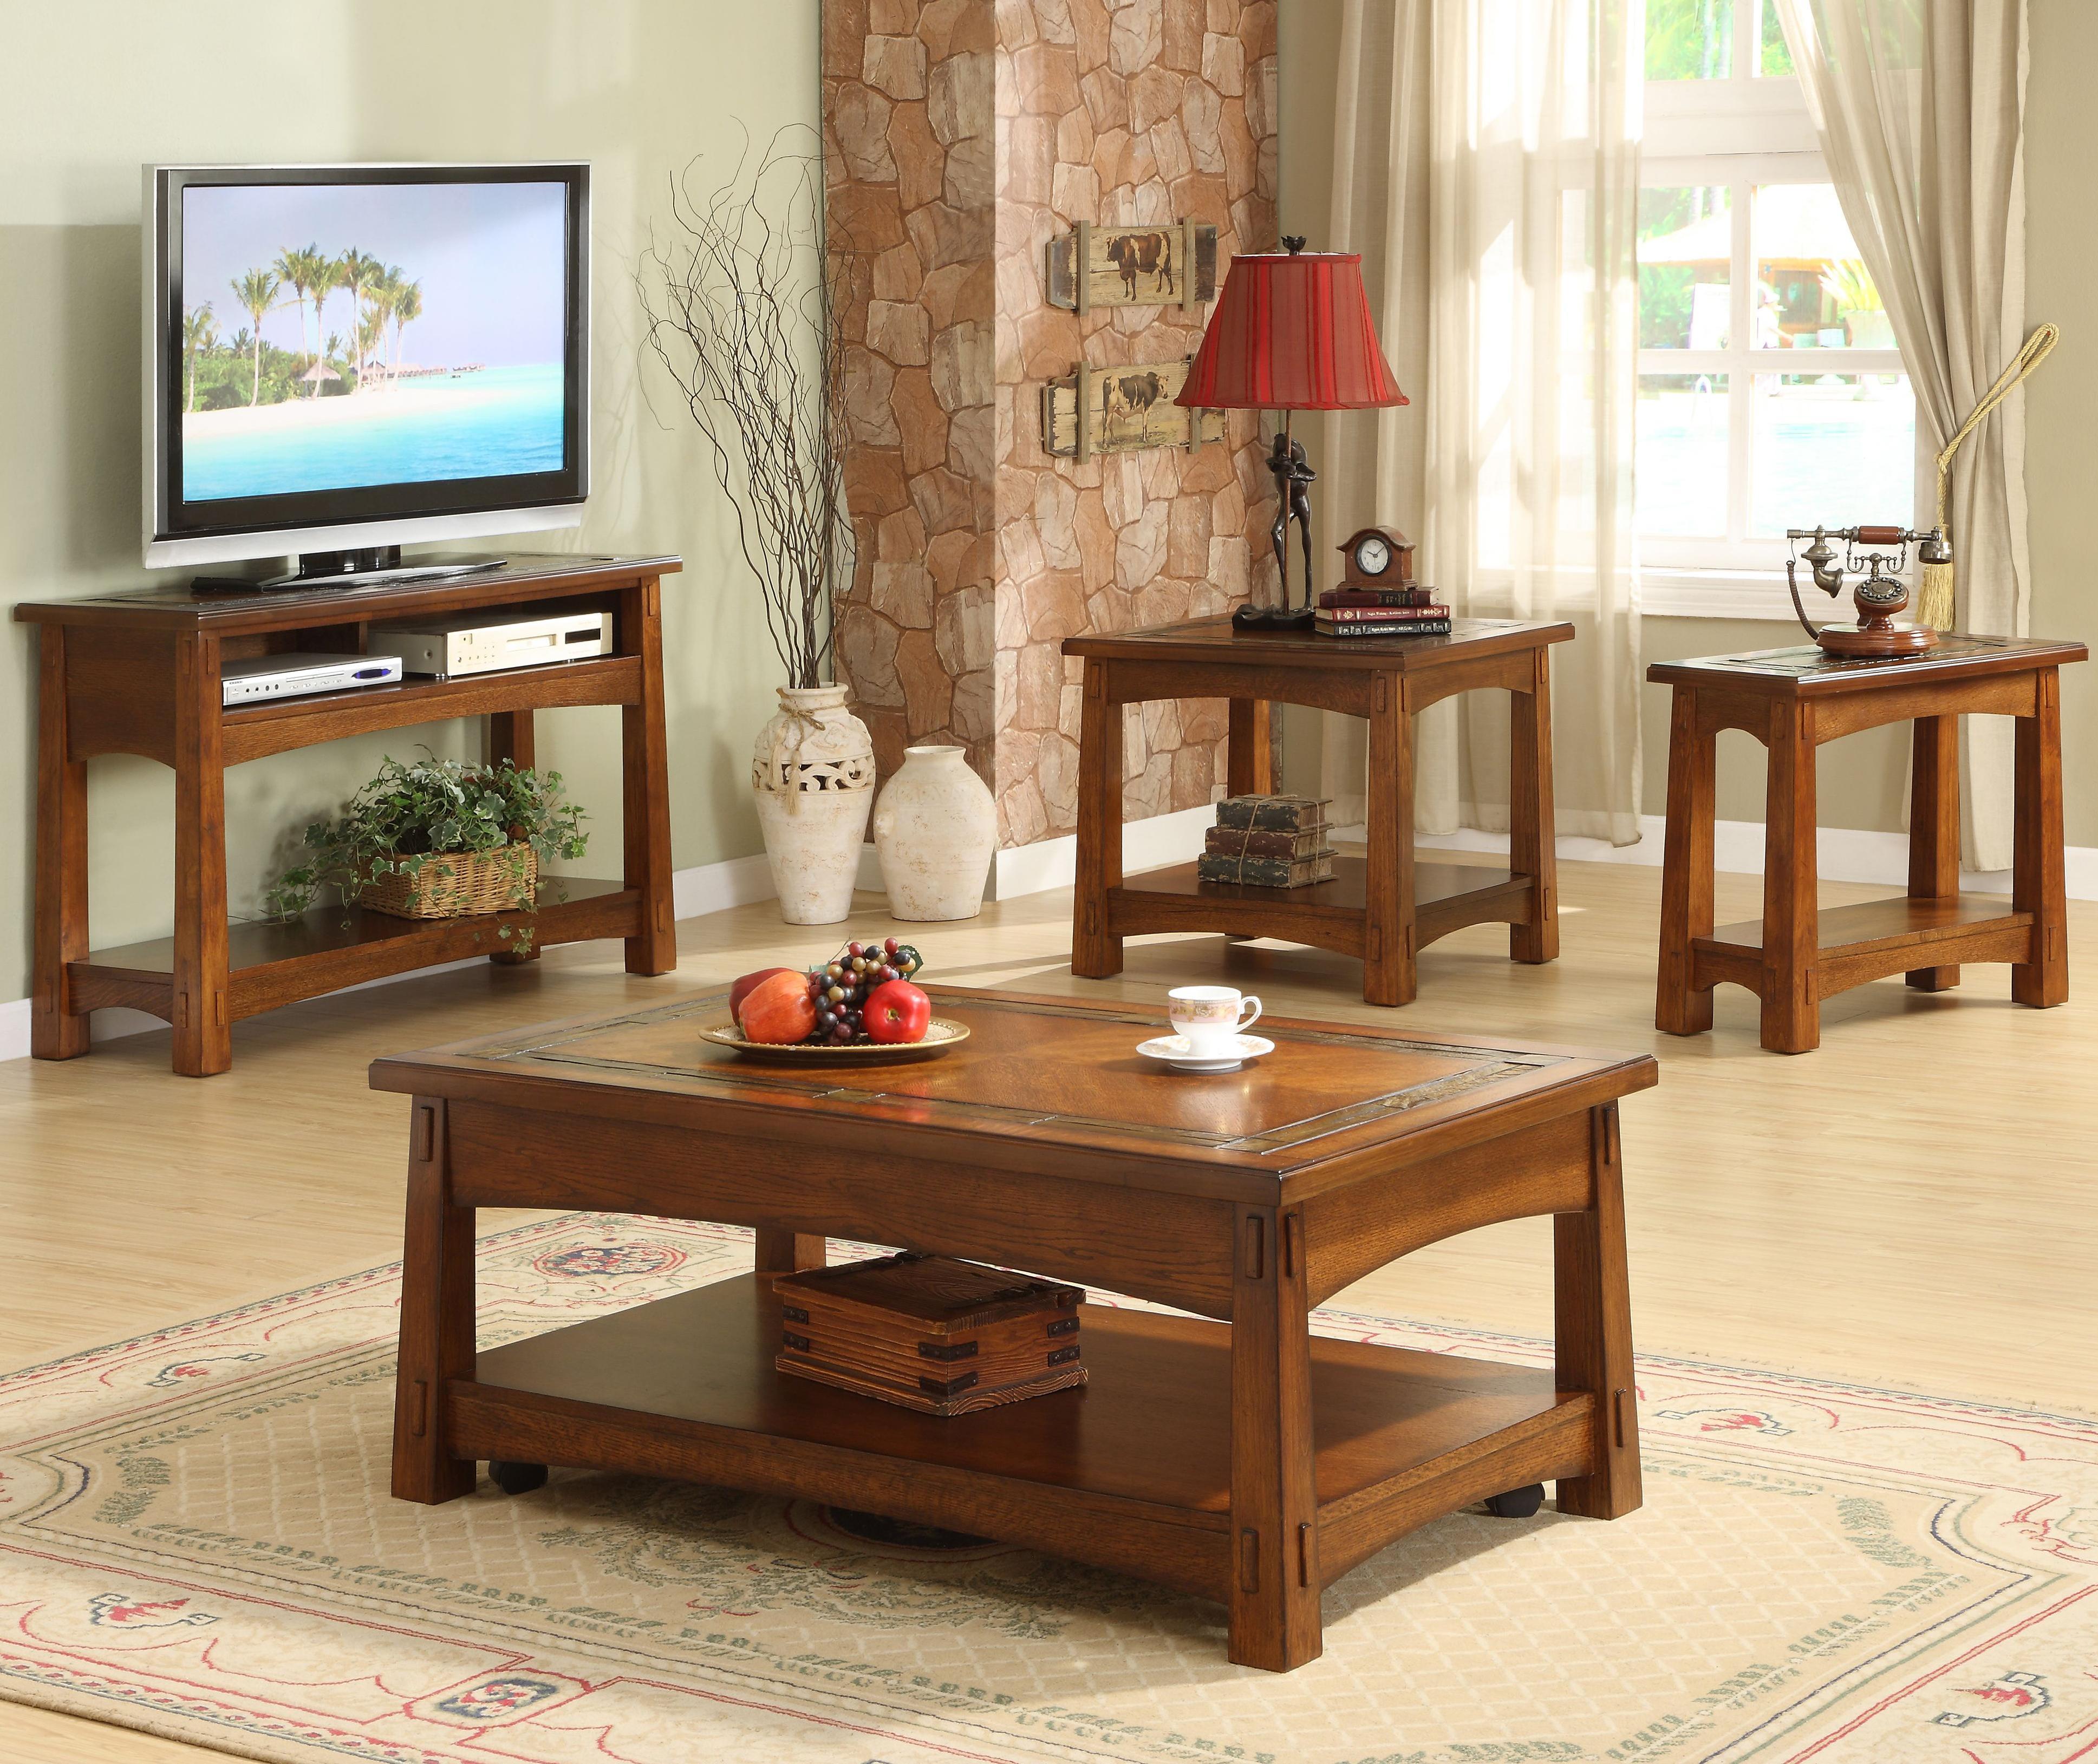 Craftsman Style Furniture: Craftsman Home (29) By Riverside Furniture